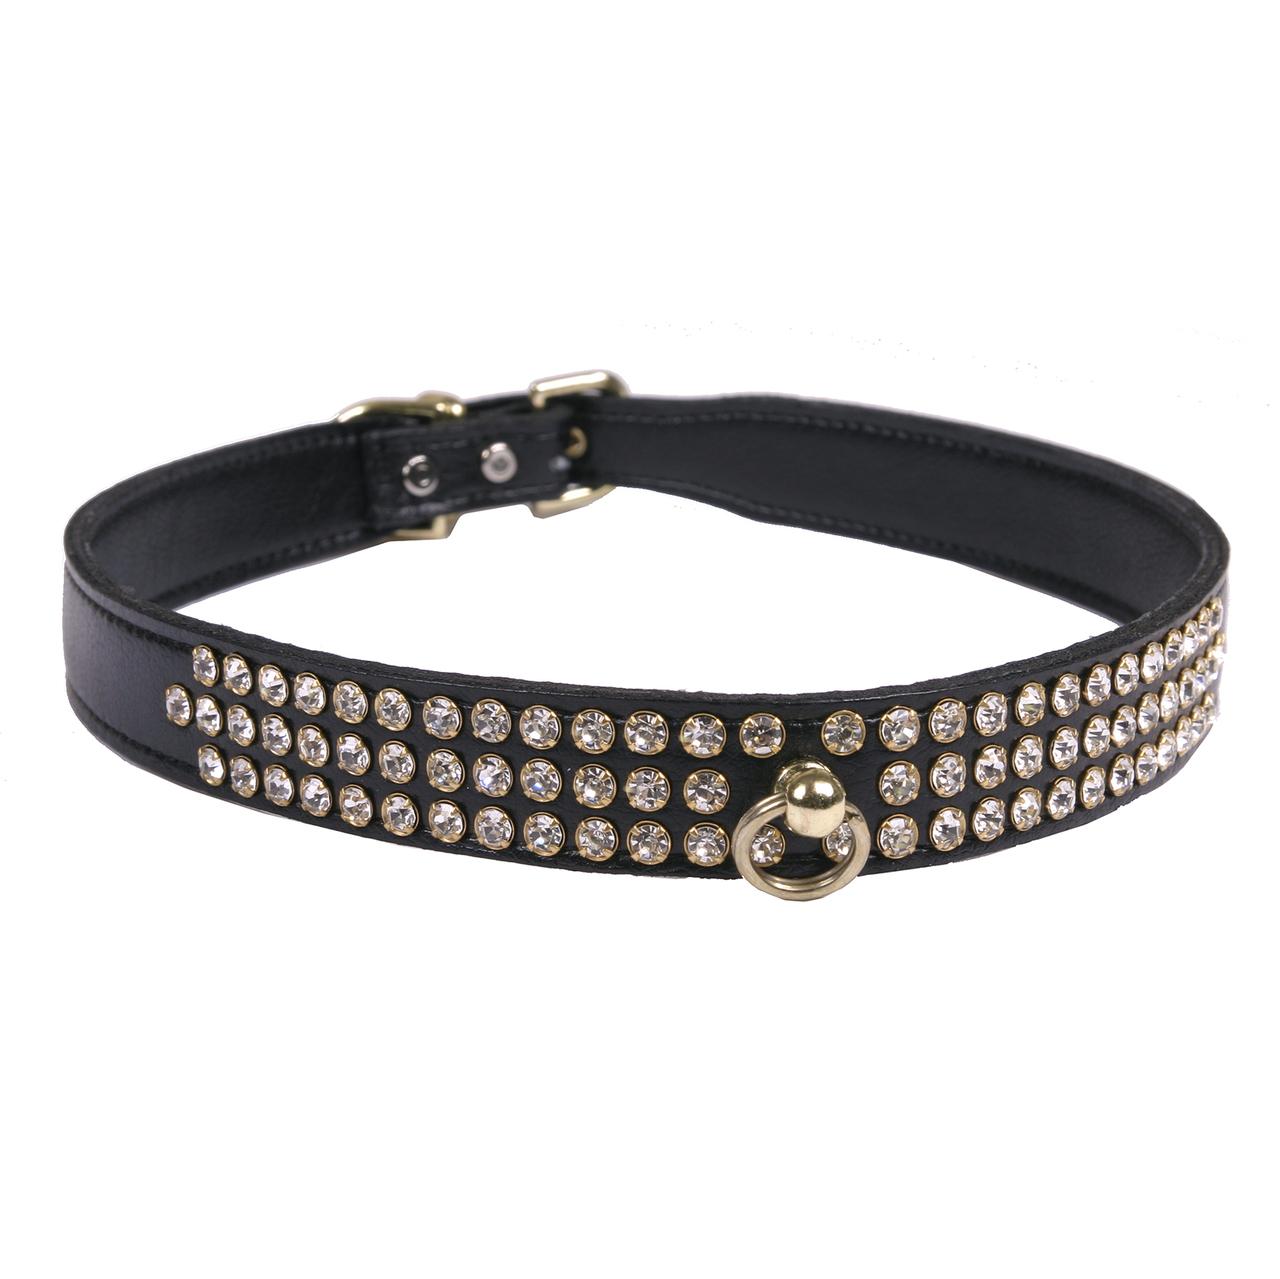 Hot Dog Leather 3-Row Crystal Dog Collar